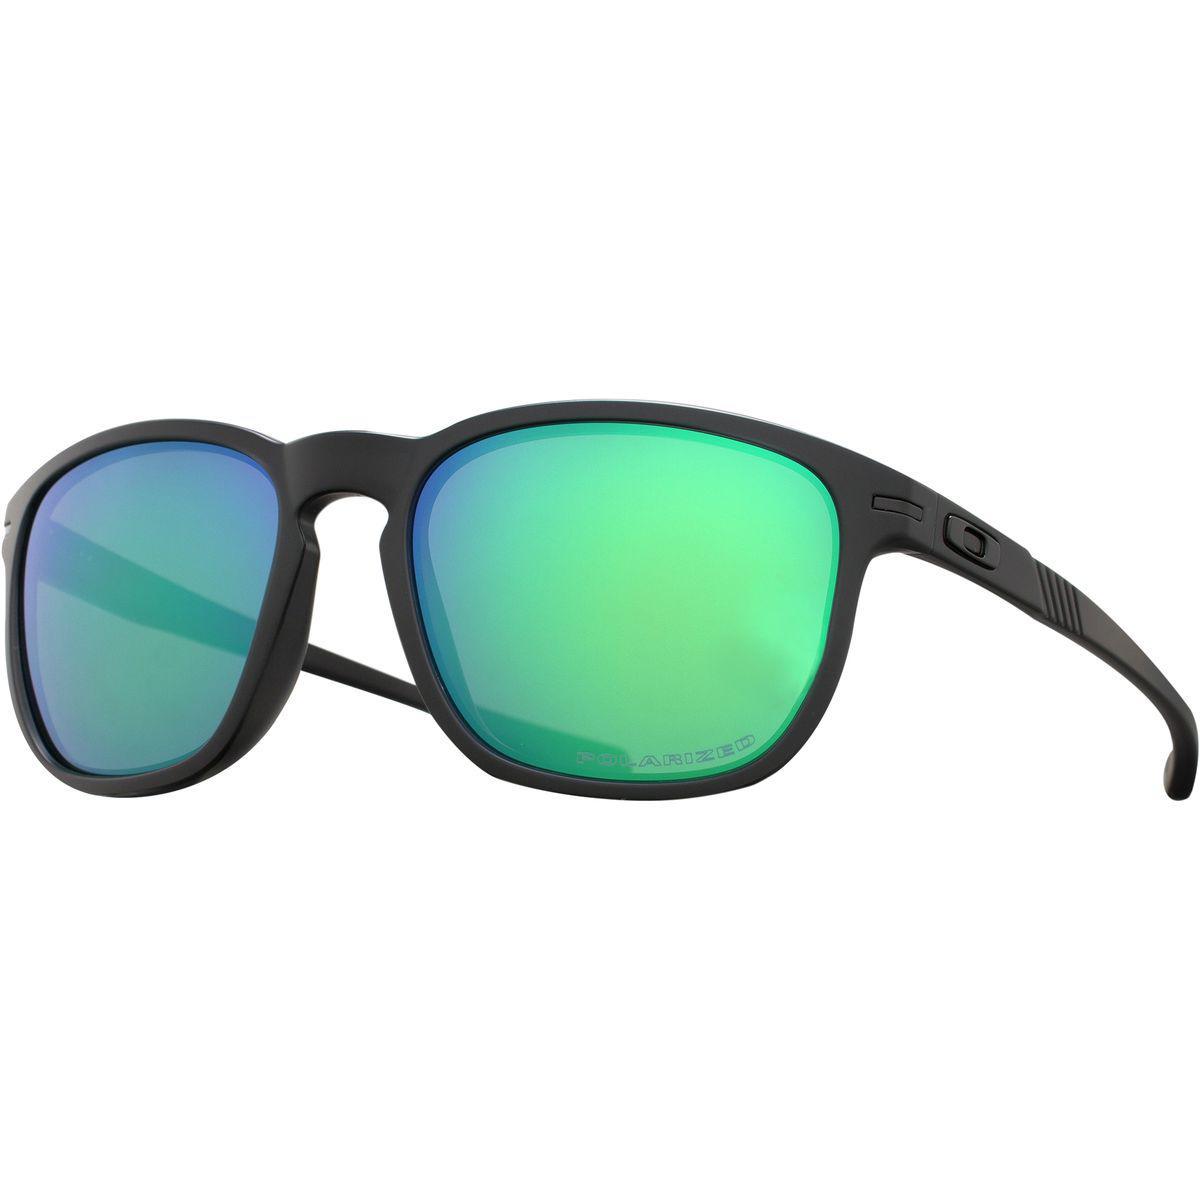 b3ab300af3a ... uk lyst oakley mph enduro sunglasses in green for men 1e281 4ccf9